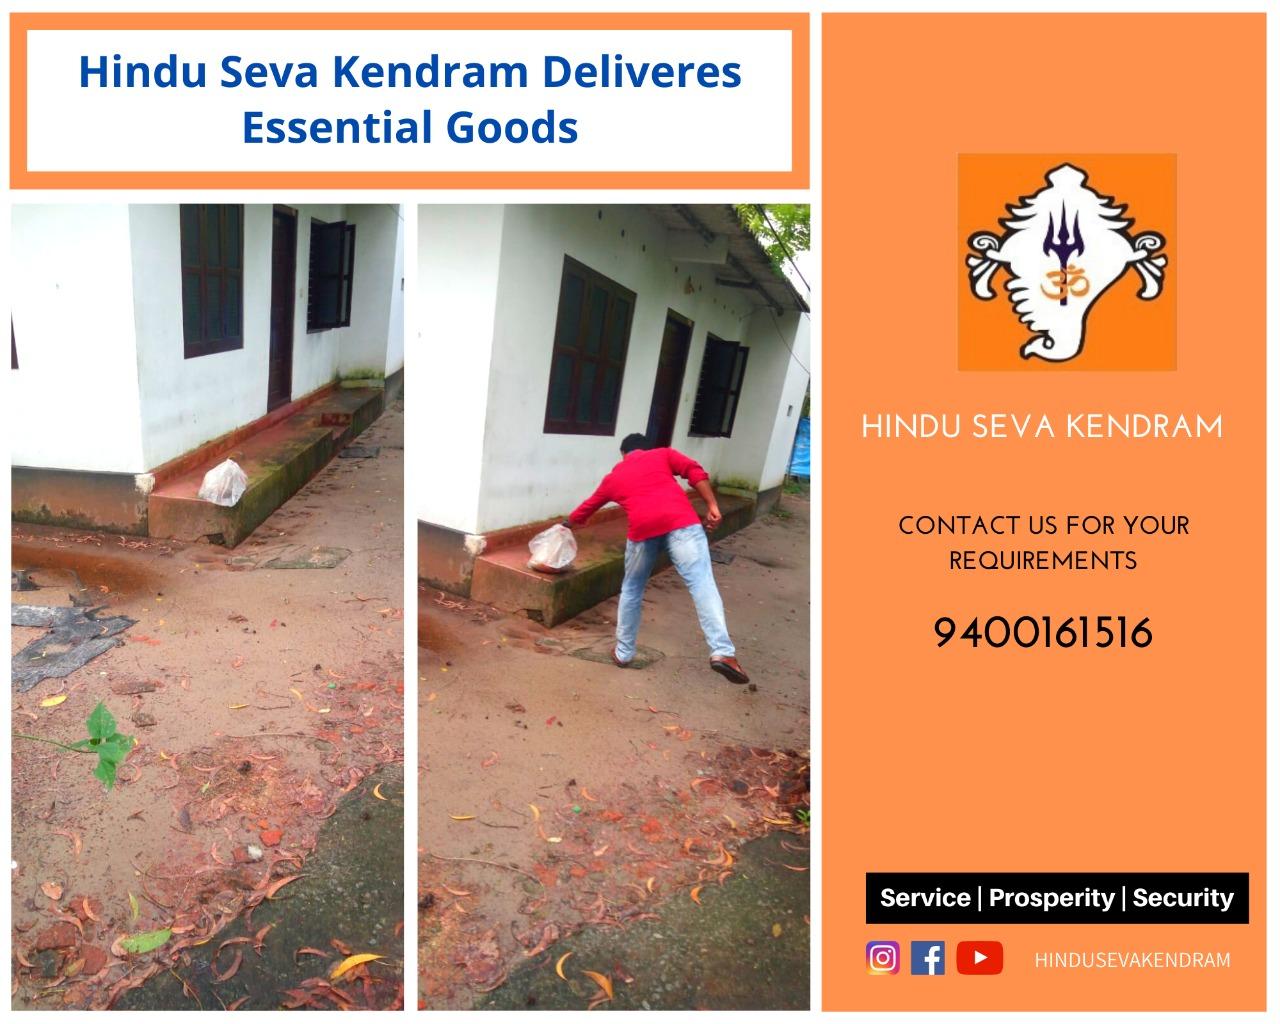 Hindu Seva Kendram Delivers Essential Goods.